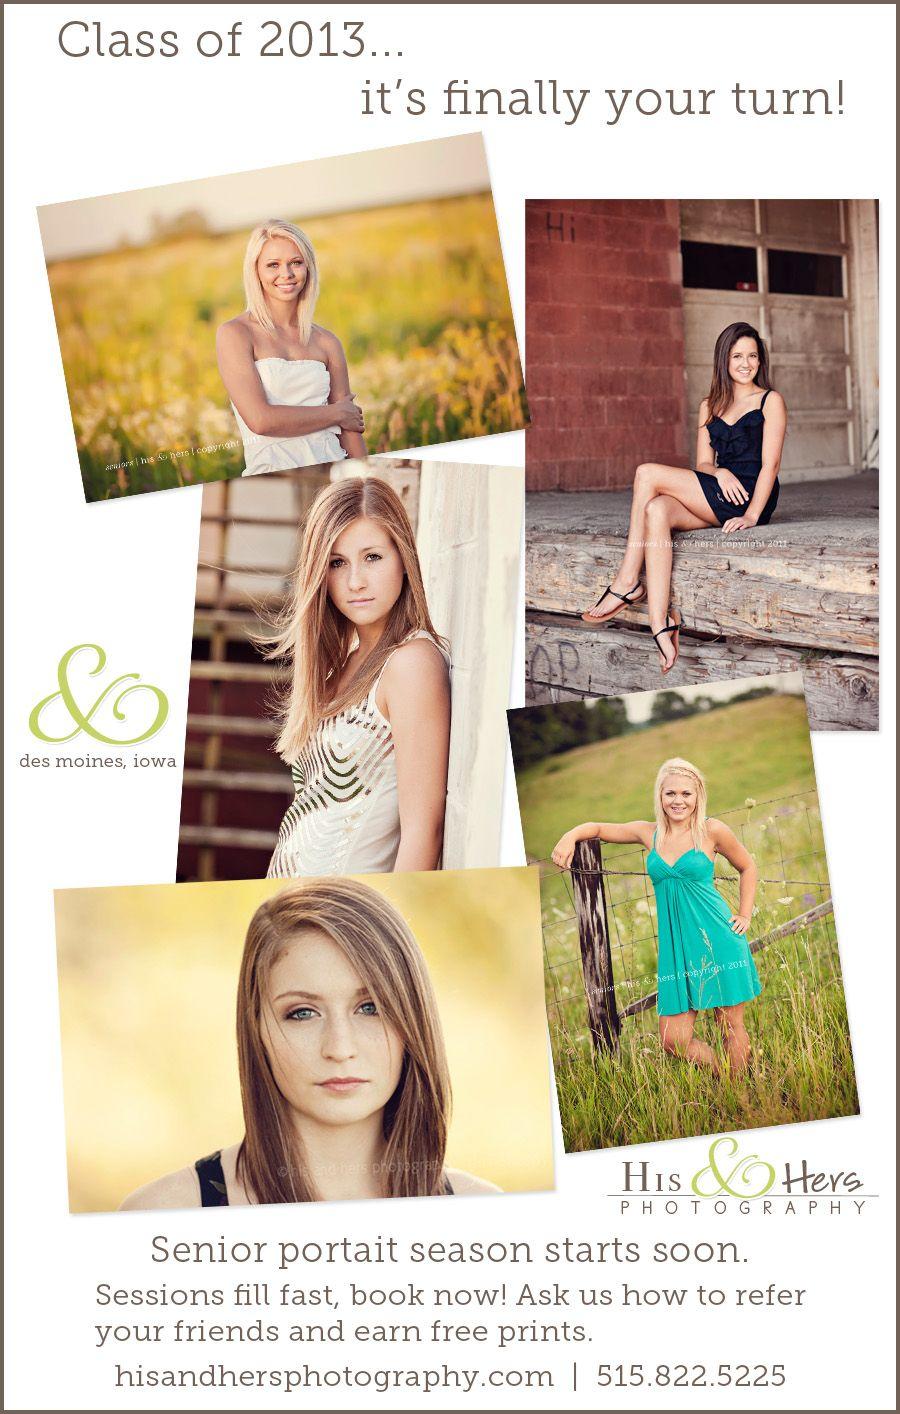 High School Seniors, Class of 2013 – Time for Senior Portraits!